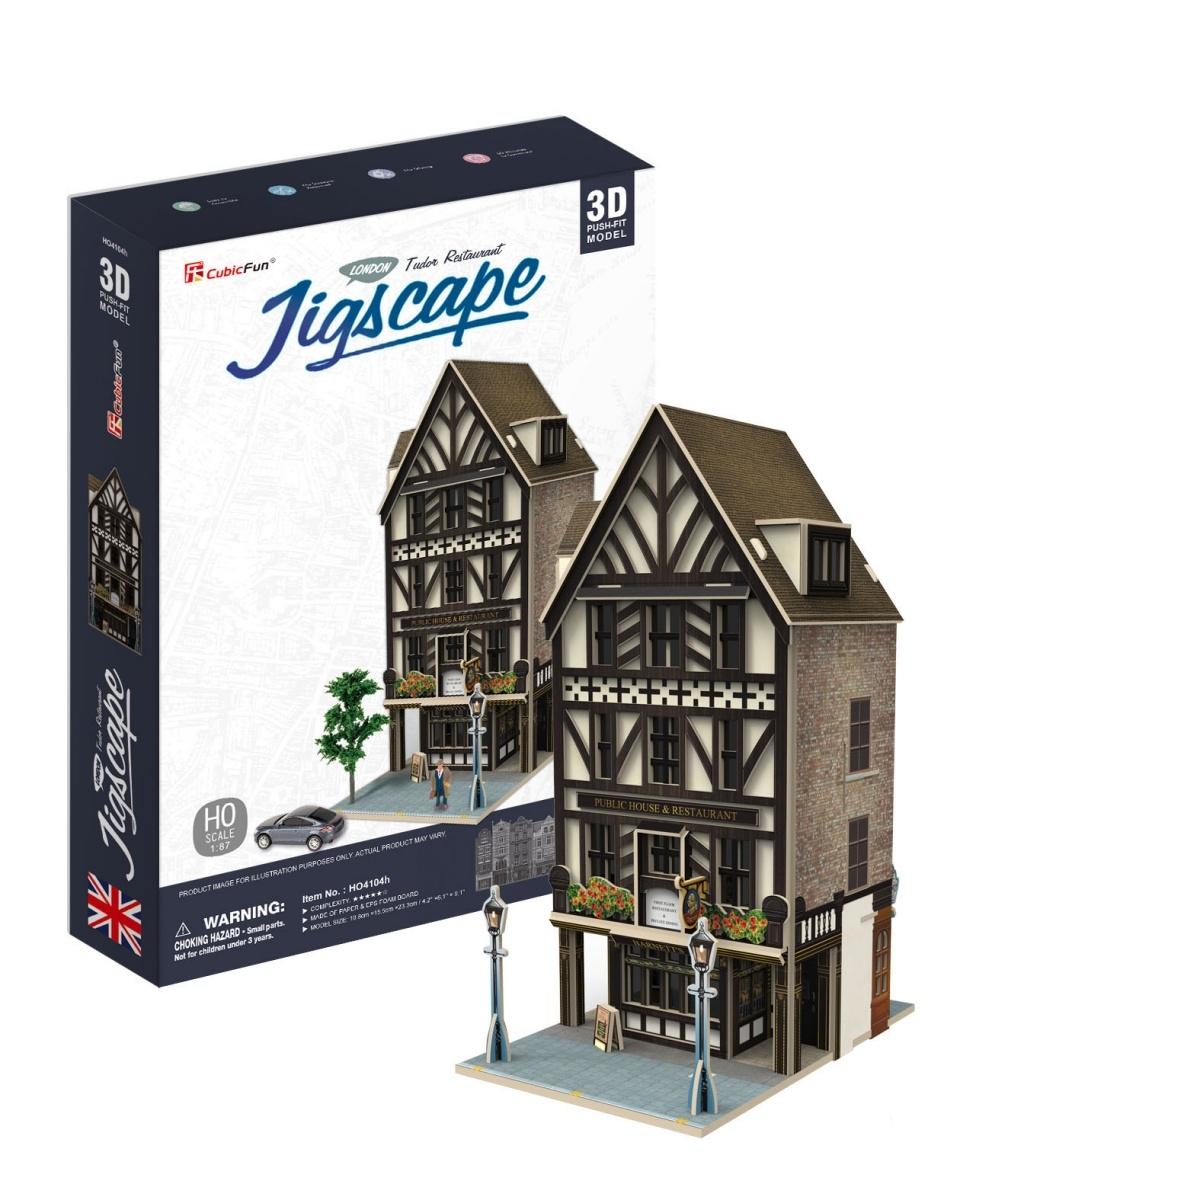 Puzzle 3D: Wielka Brytania, Tudor Restaurant - Jigscape (306-24104)